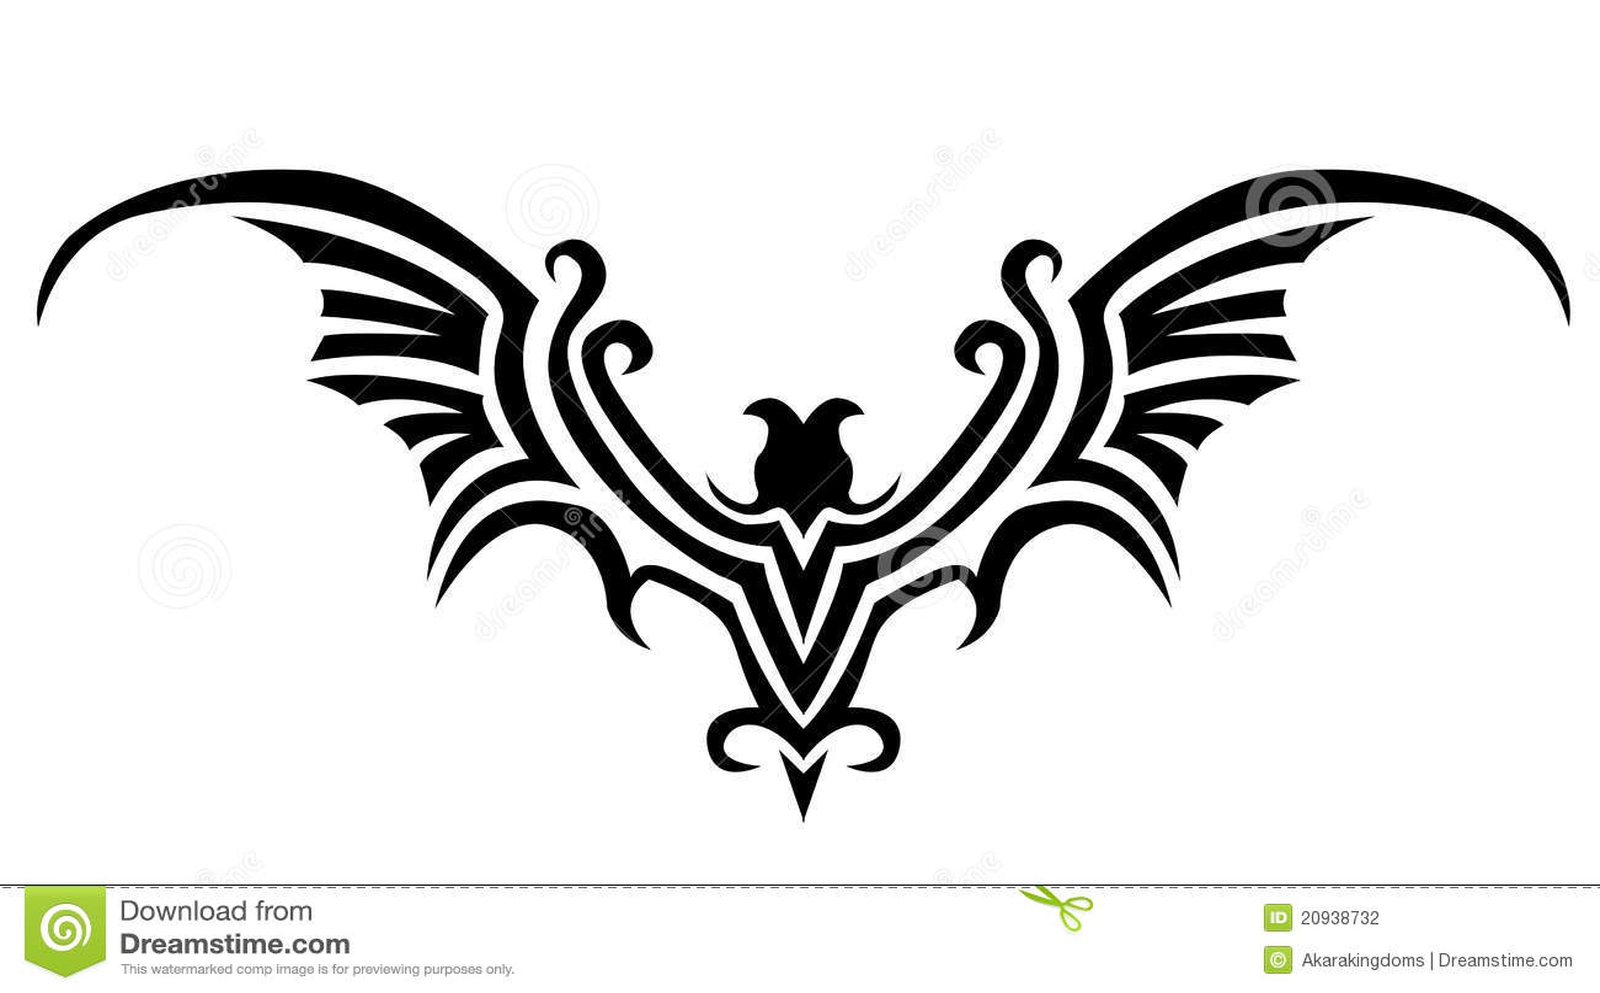 Bat tattoo stock vector illustration of heraldic freedom for Freedom tribal tattoos